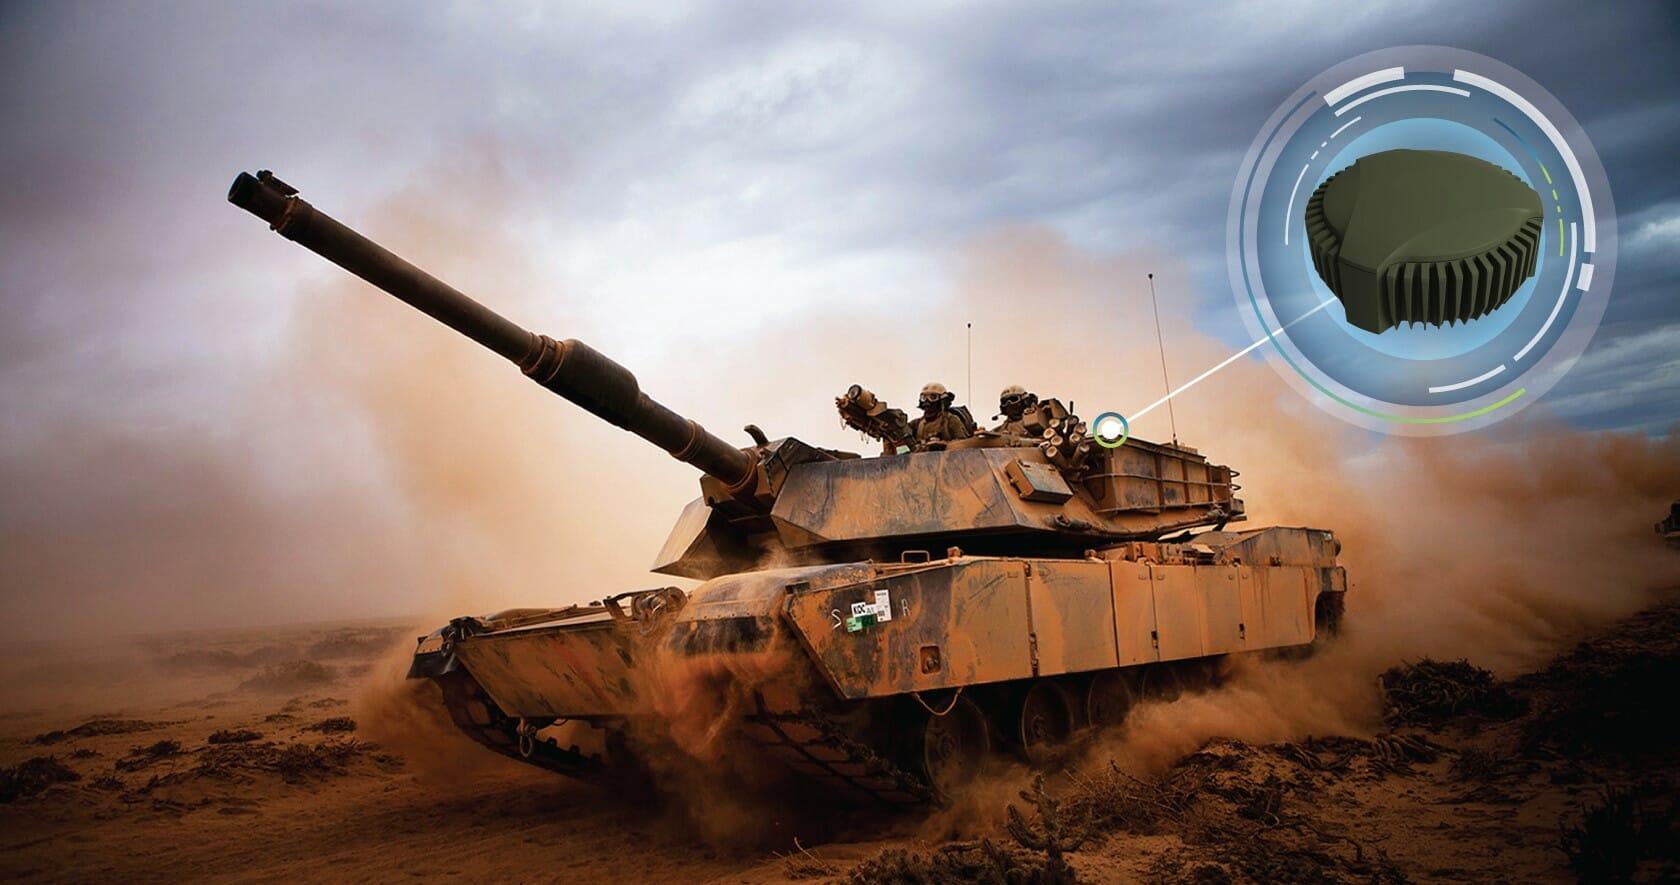 Hexagon_AP_NovAtel_GAJT-710ML on Action Tank